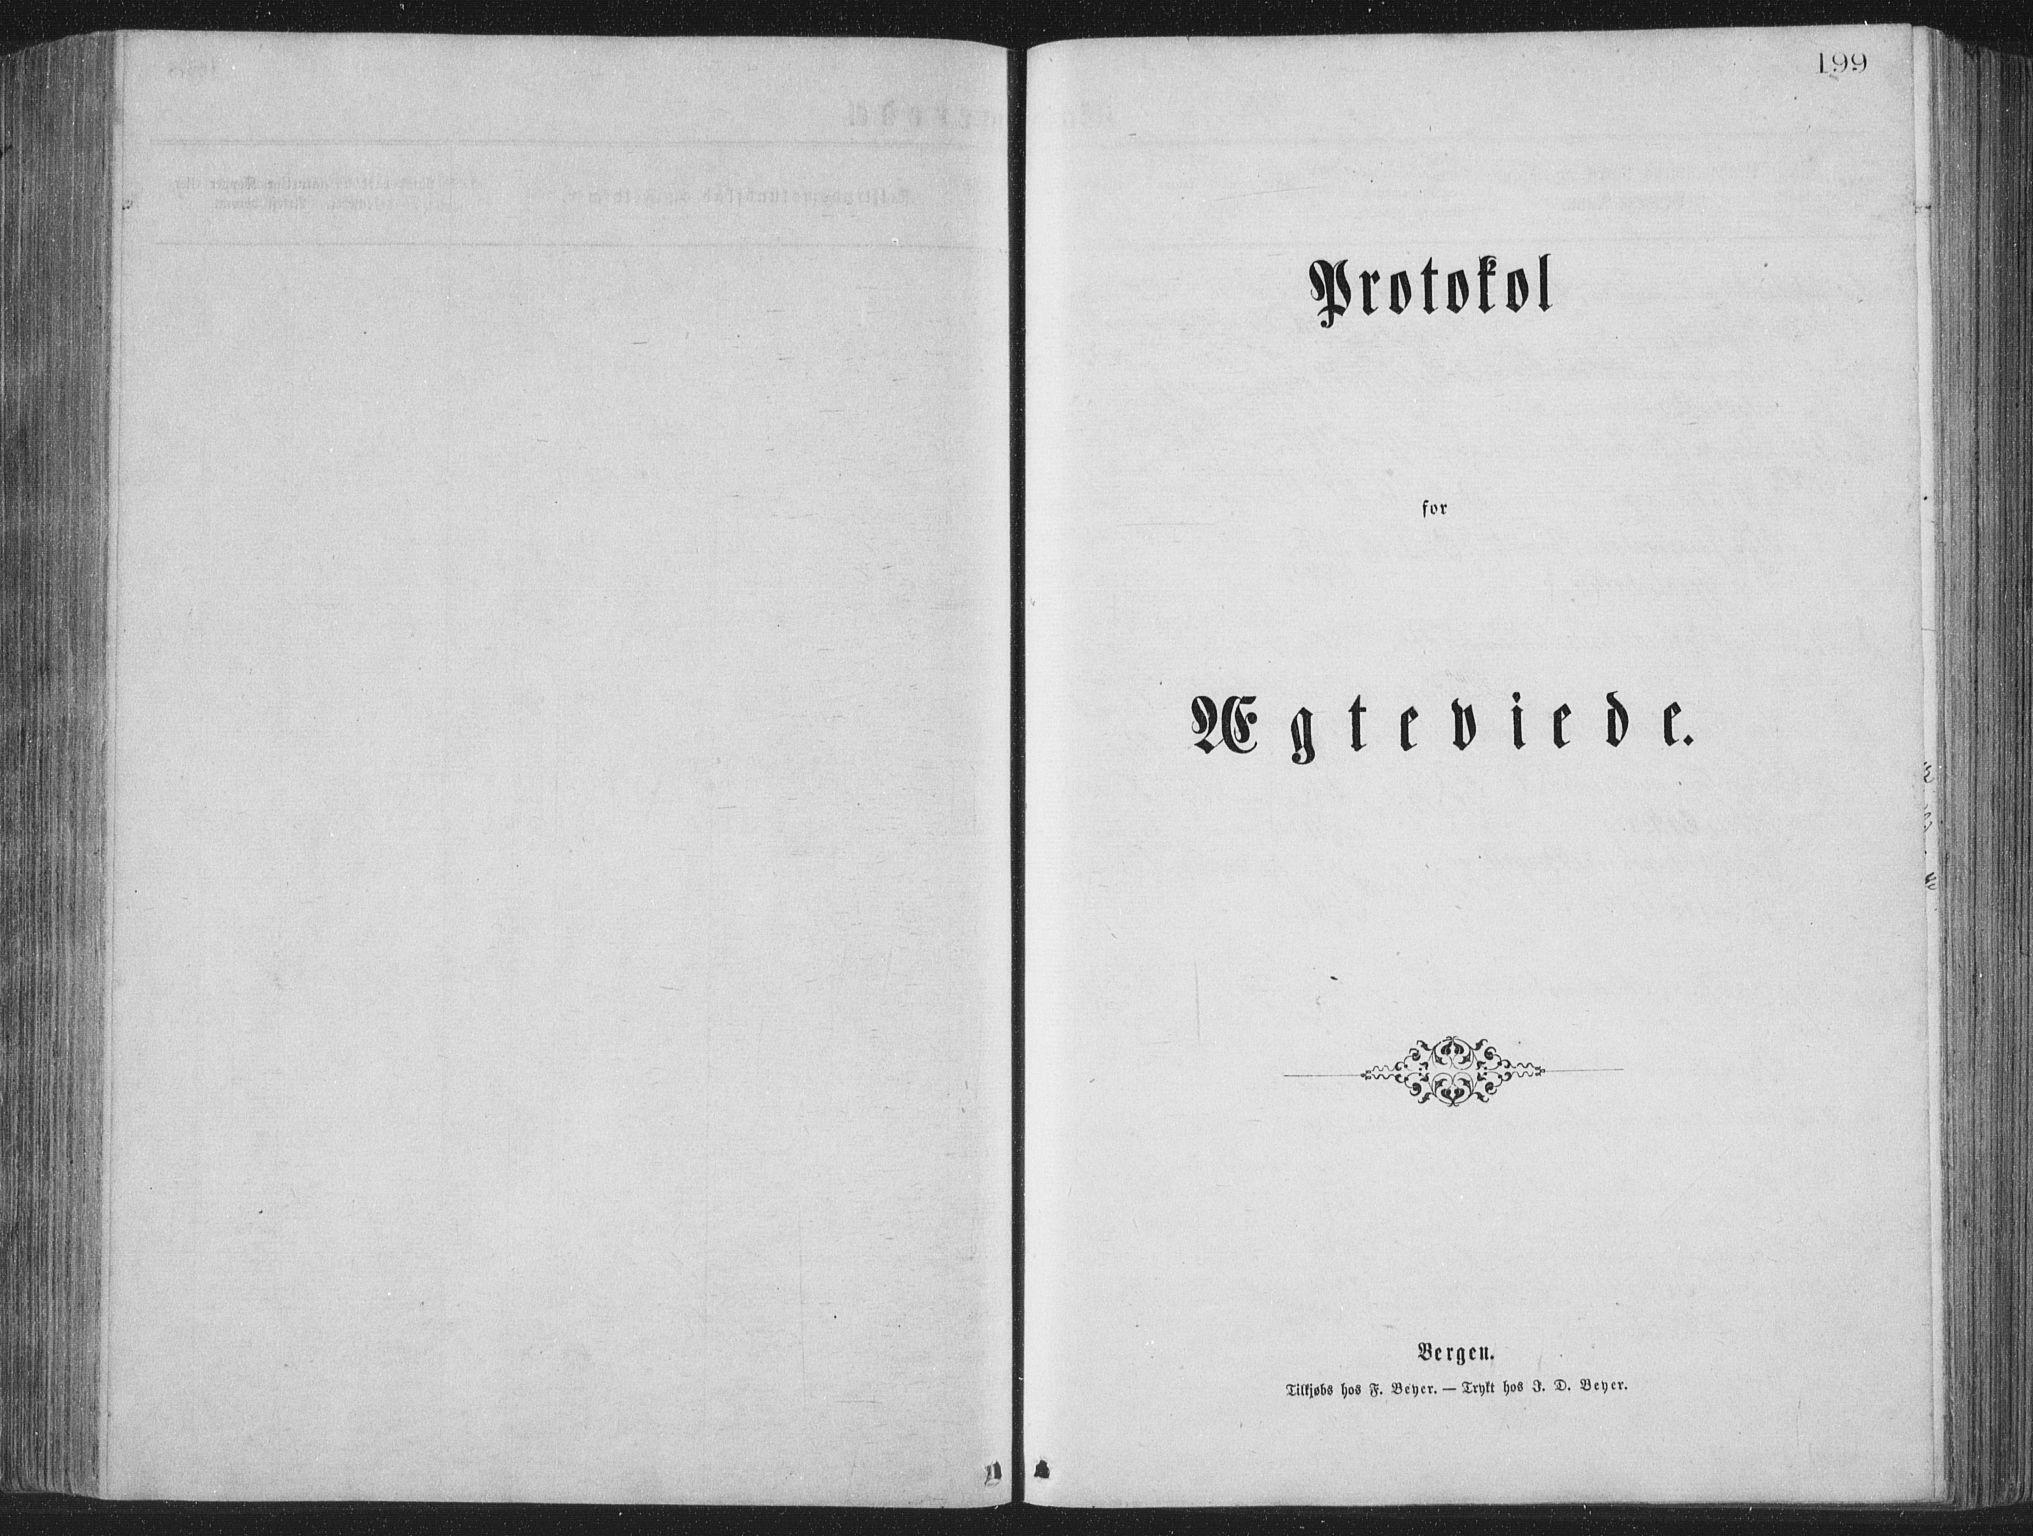 SAT, Ministerialprotokoller, klokkerbøker og fødselsregistre - Nordland, 885/L1213: Klokkerbok nr. 885C02, 1874-1892, s. 199